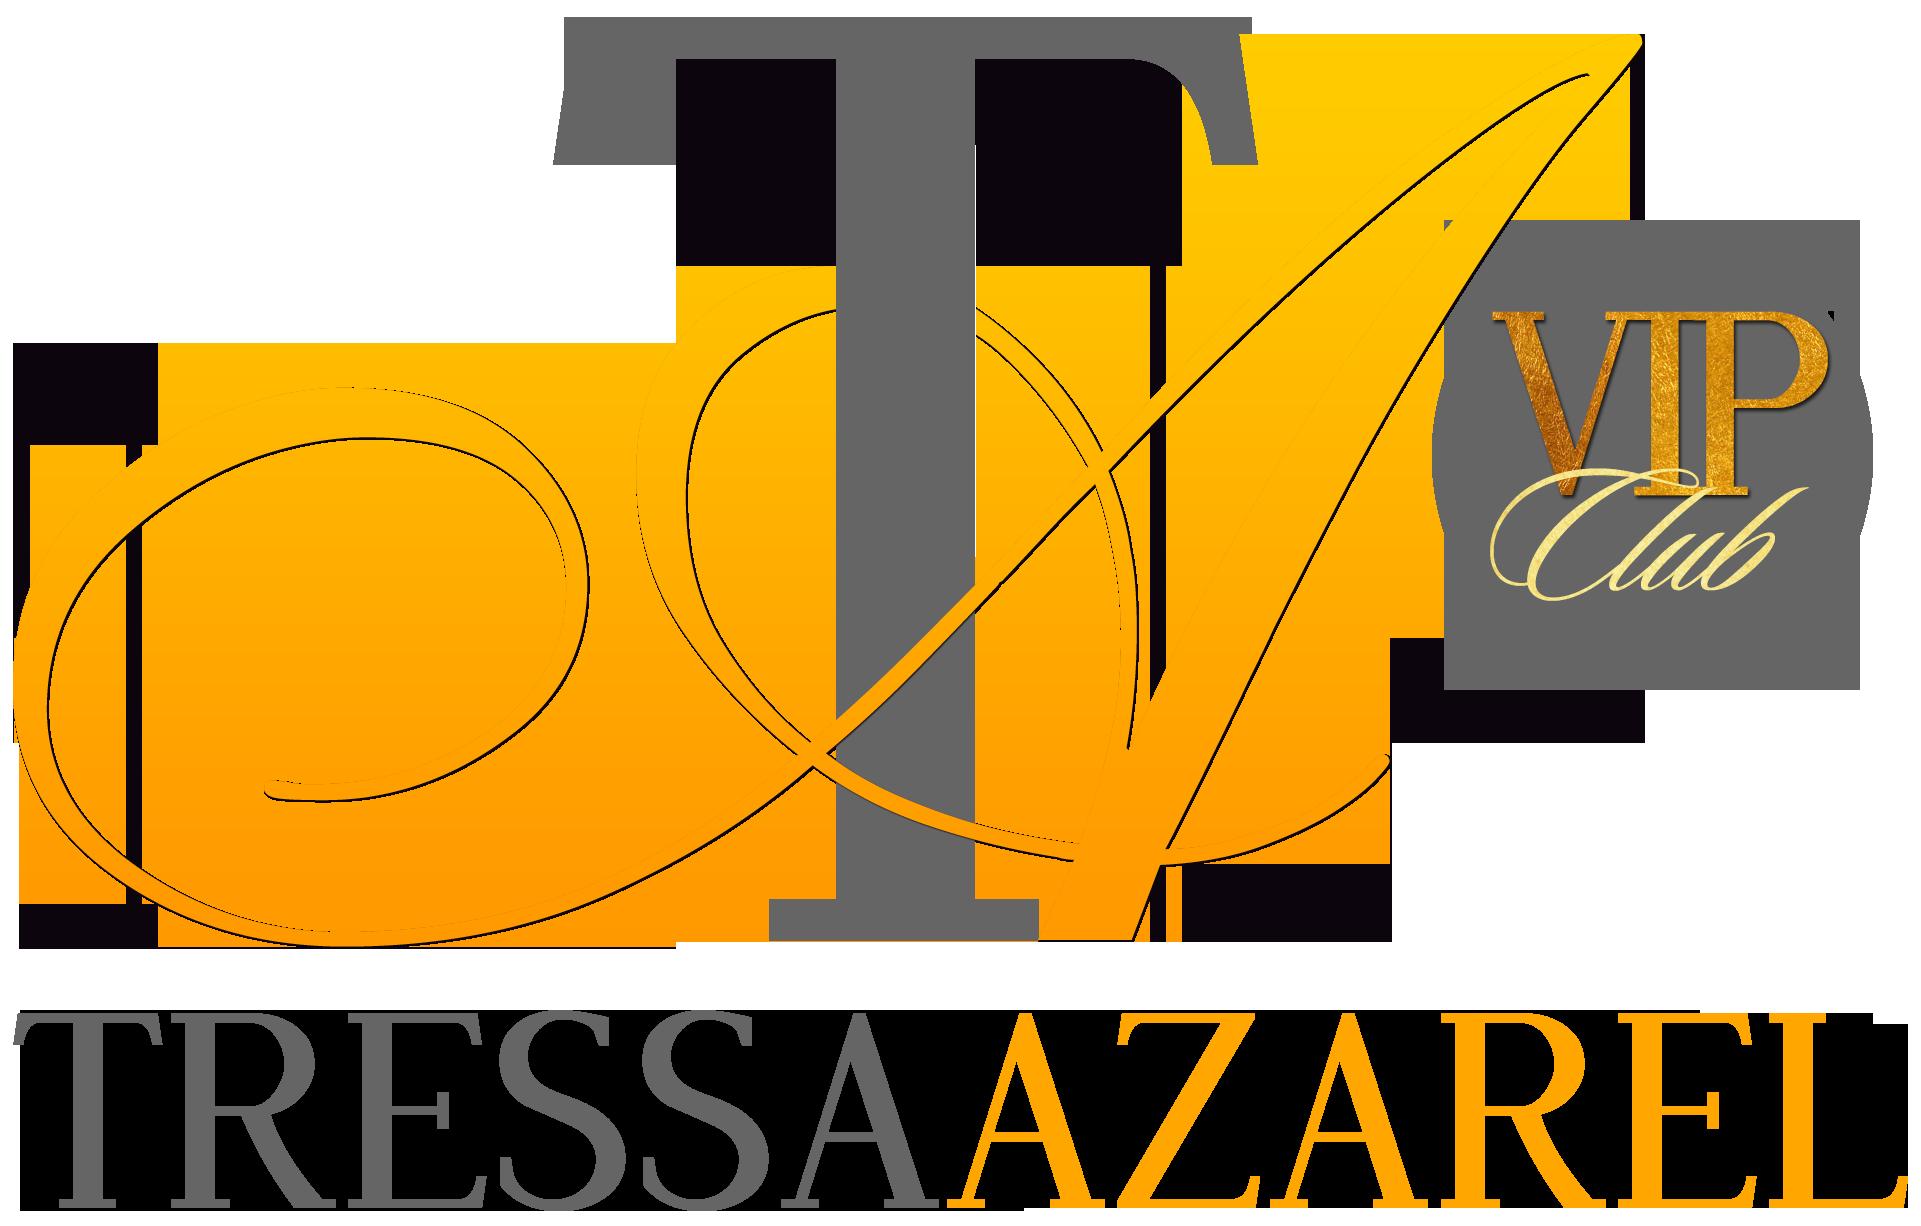 TressaAzarel VIP Club